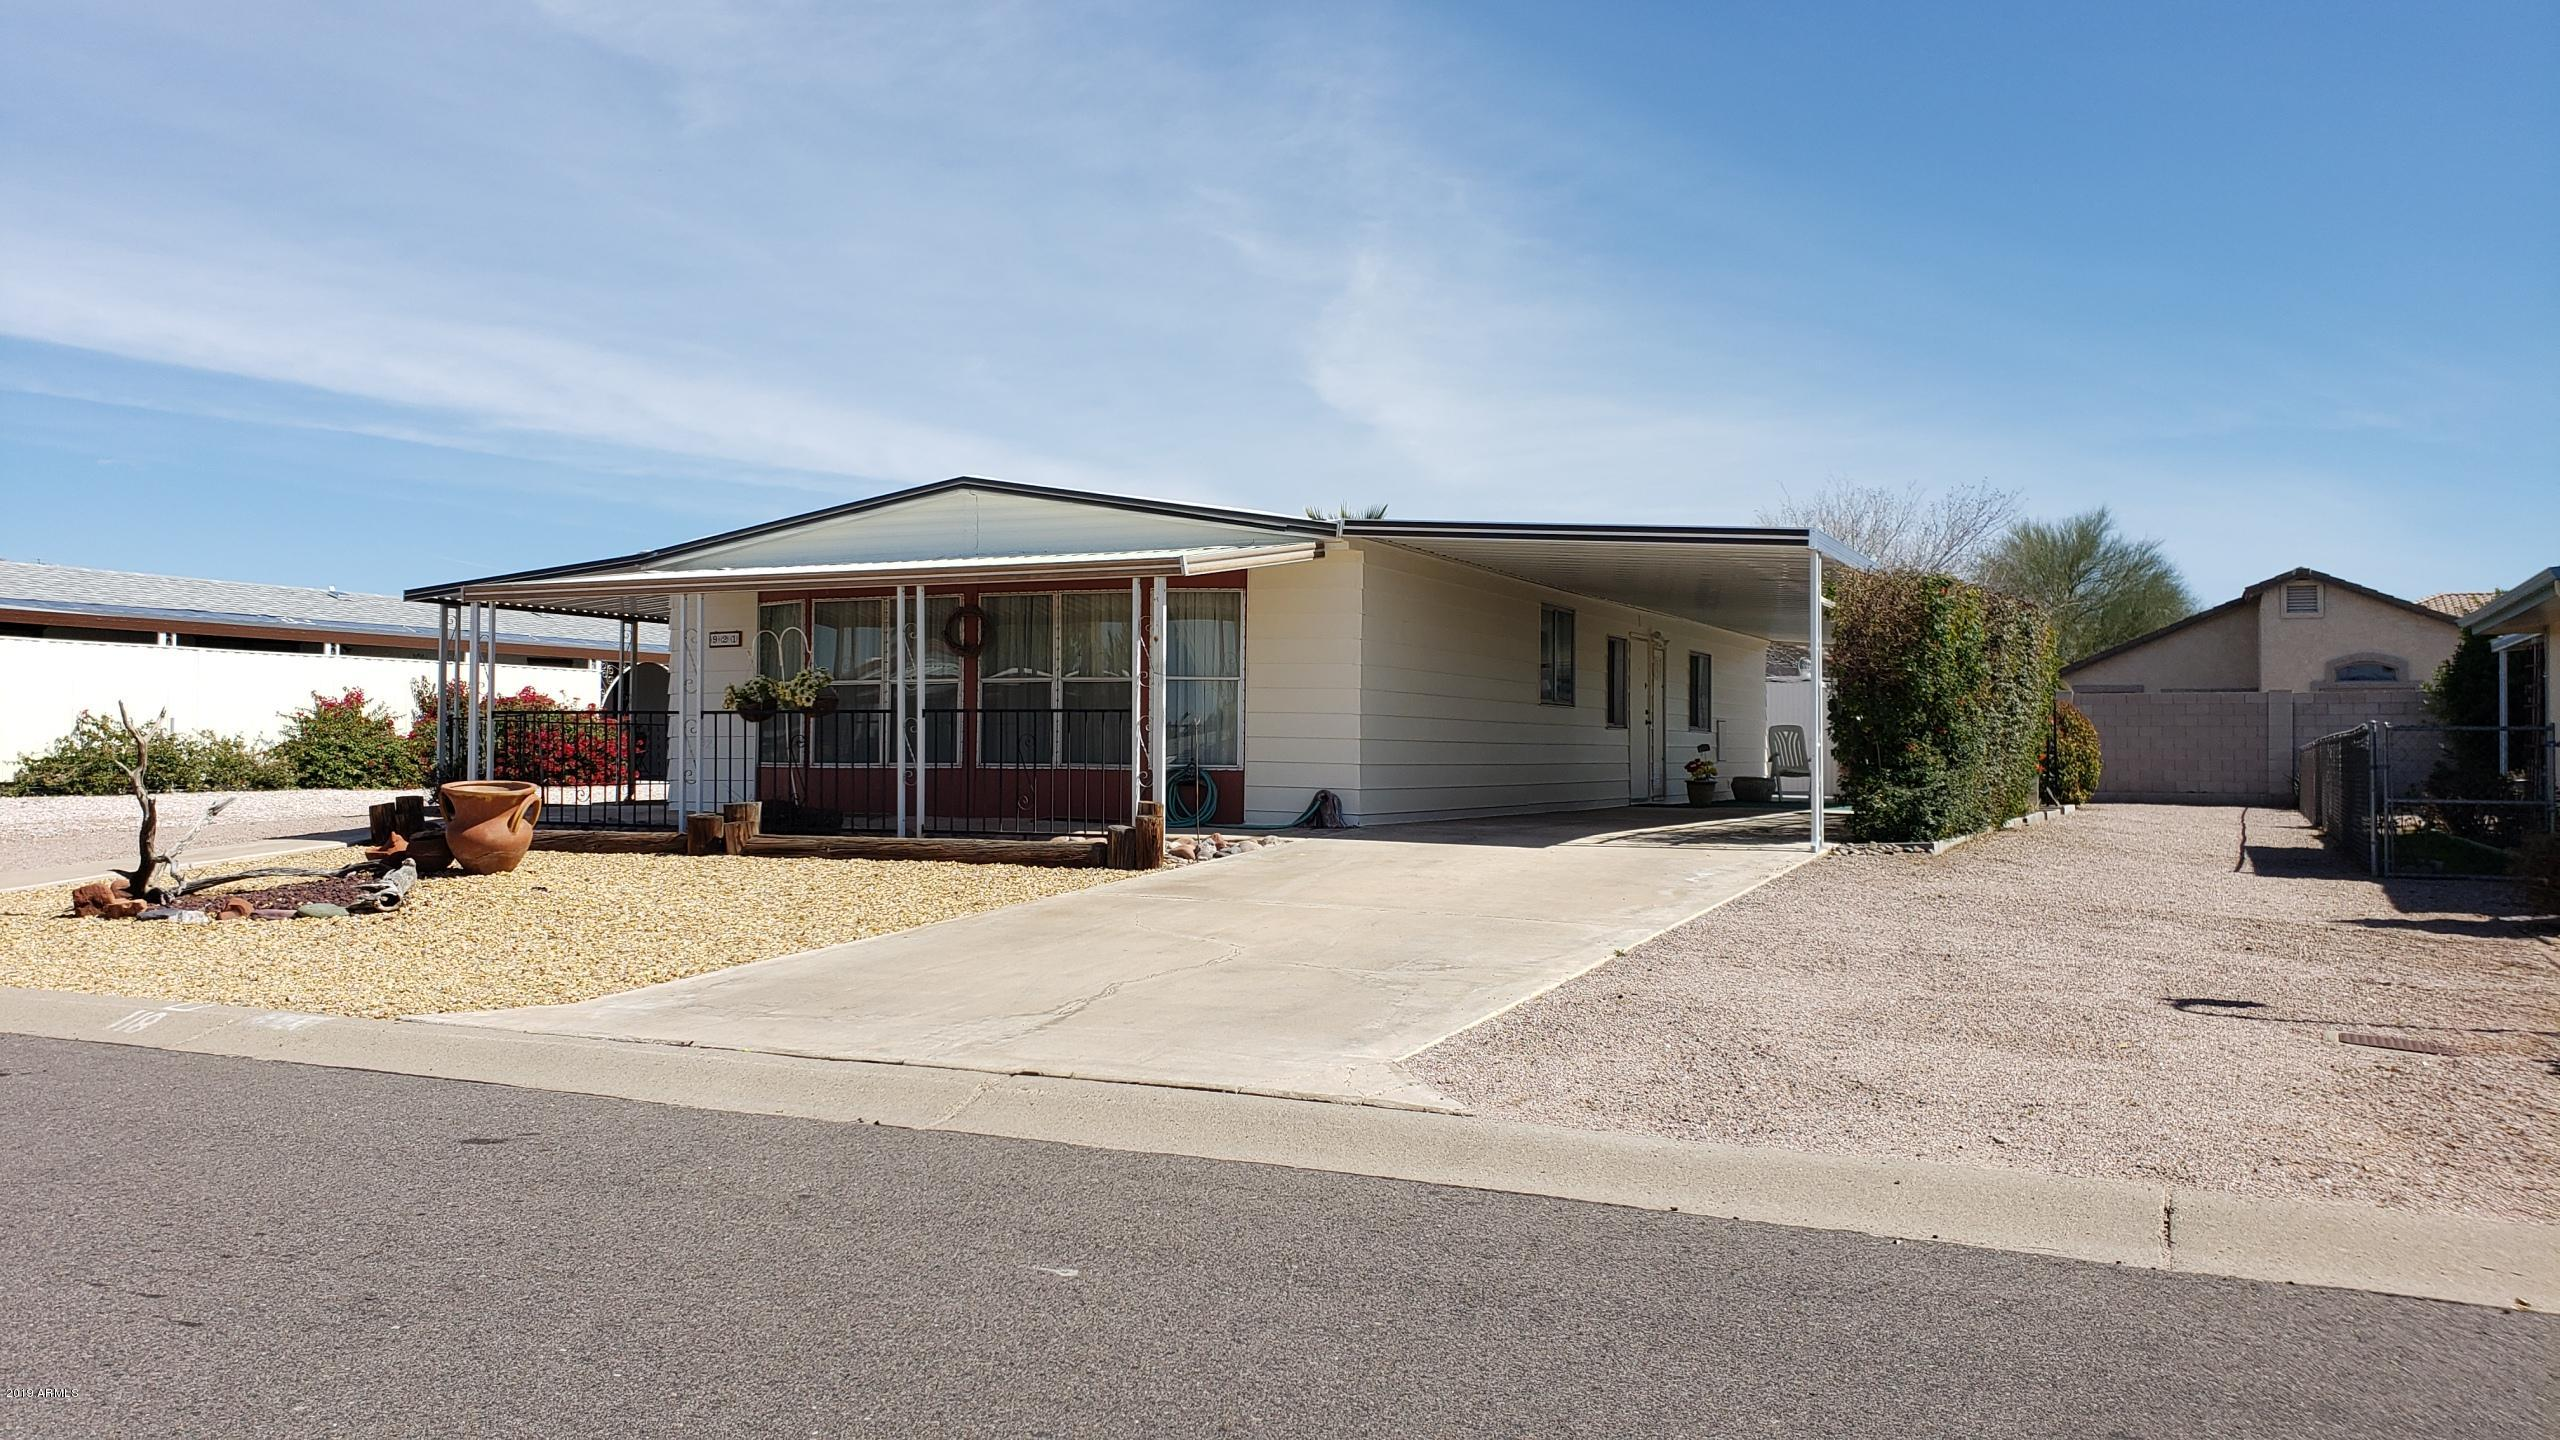 Photo of 921 S 98TH Street, Mesa, AZ 85208